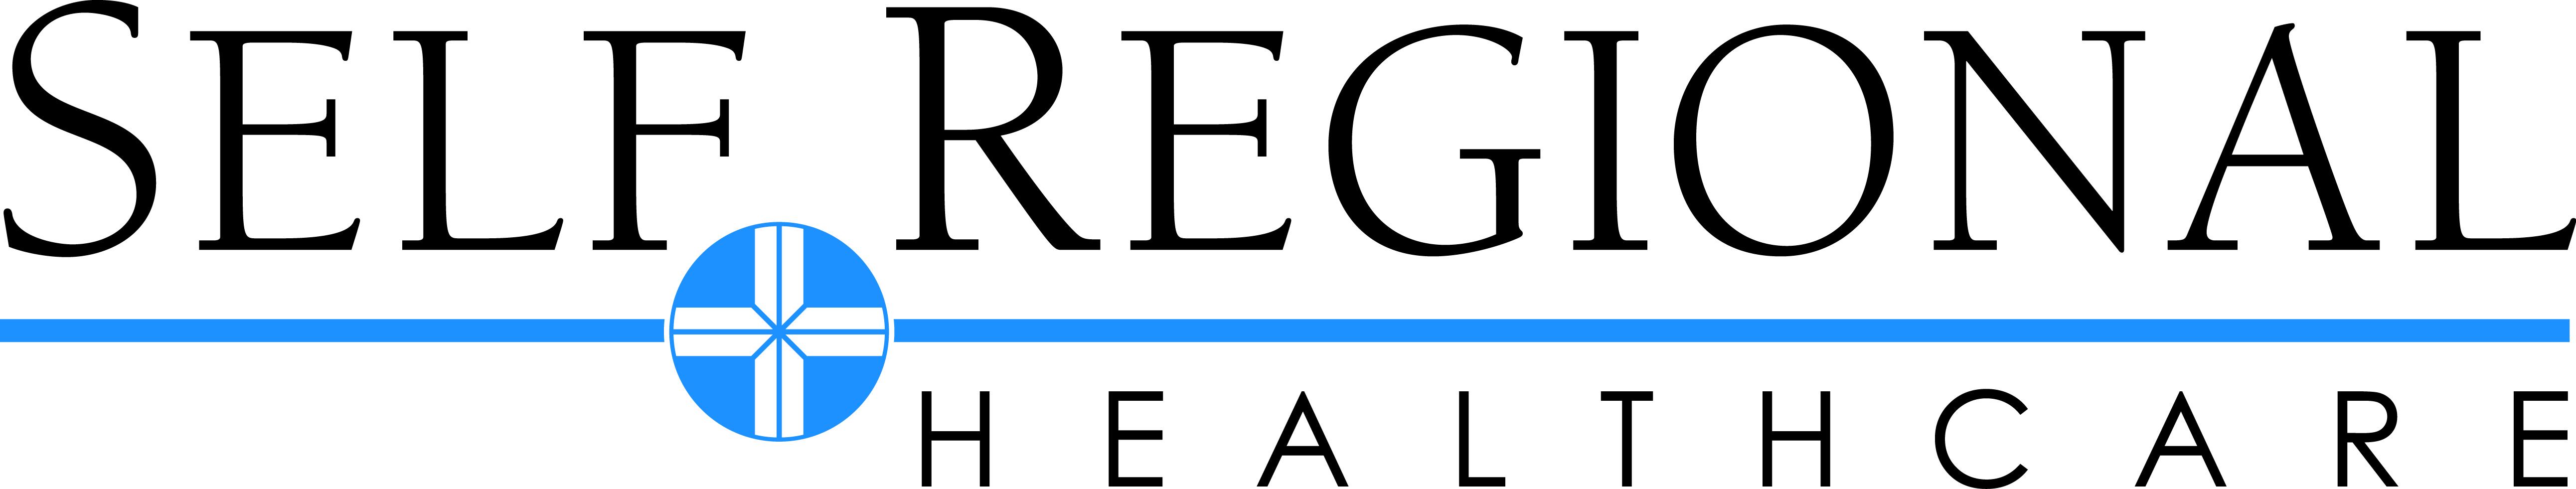 Self Regional Hospital